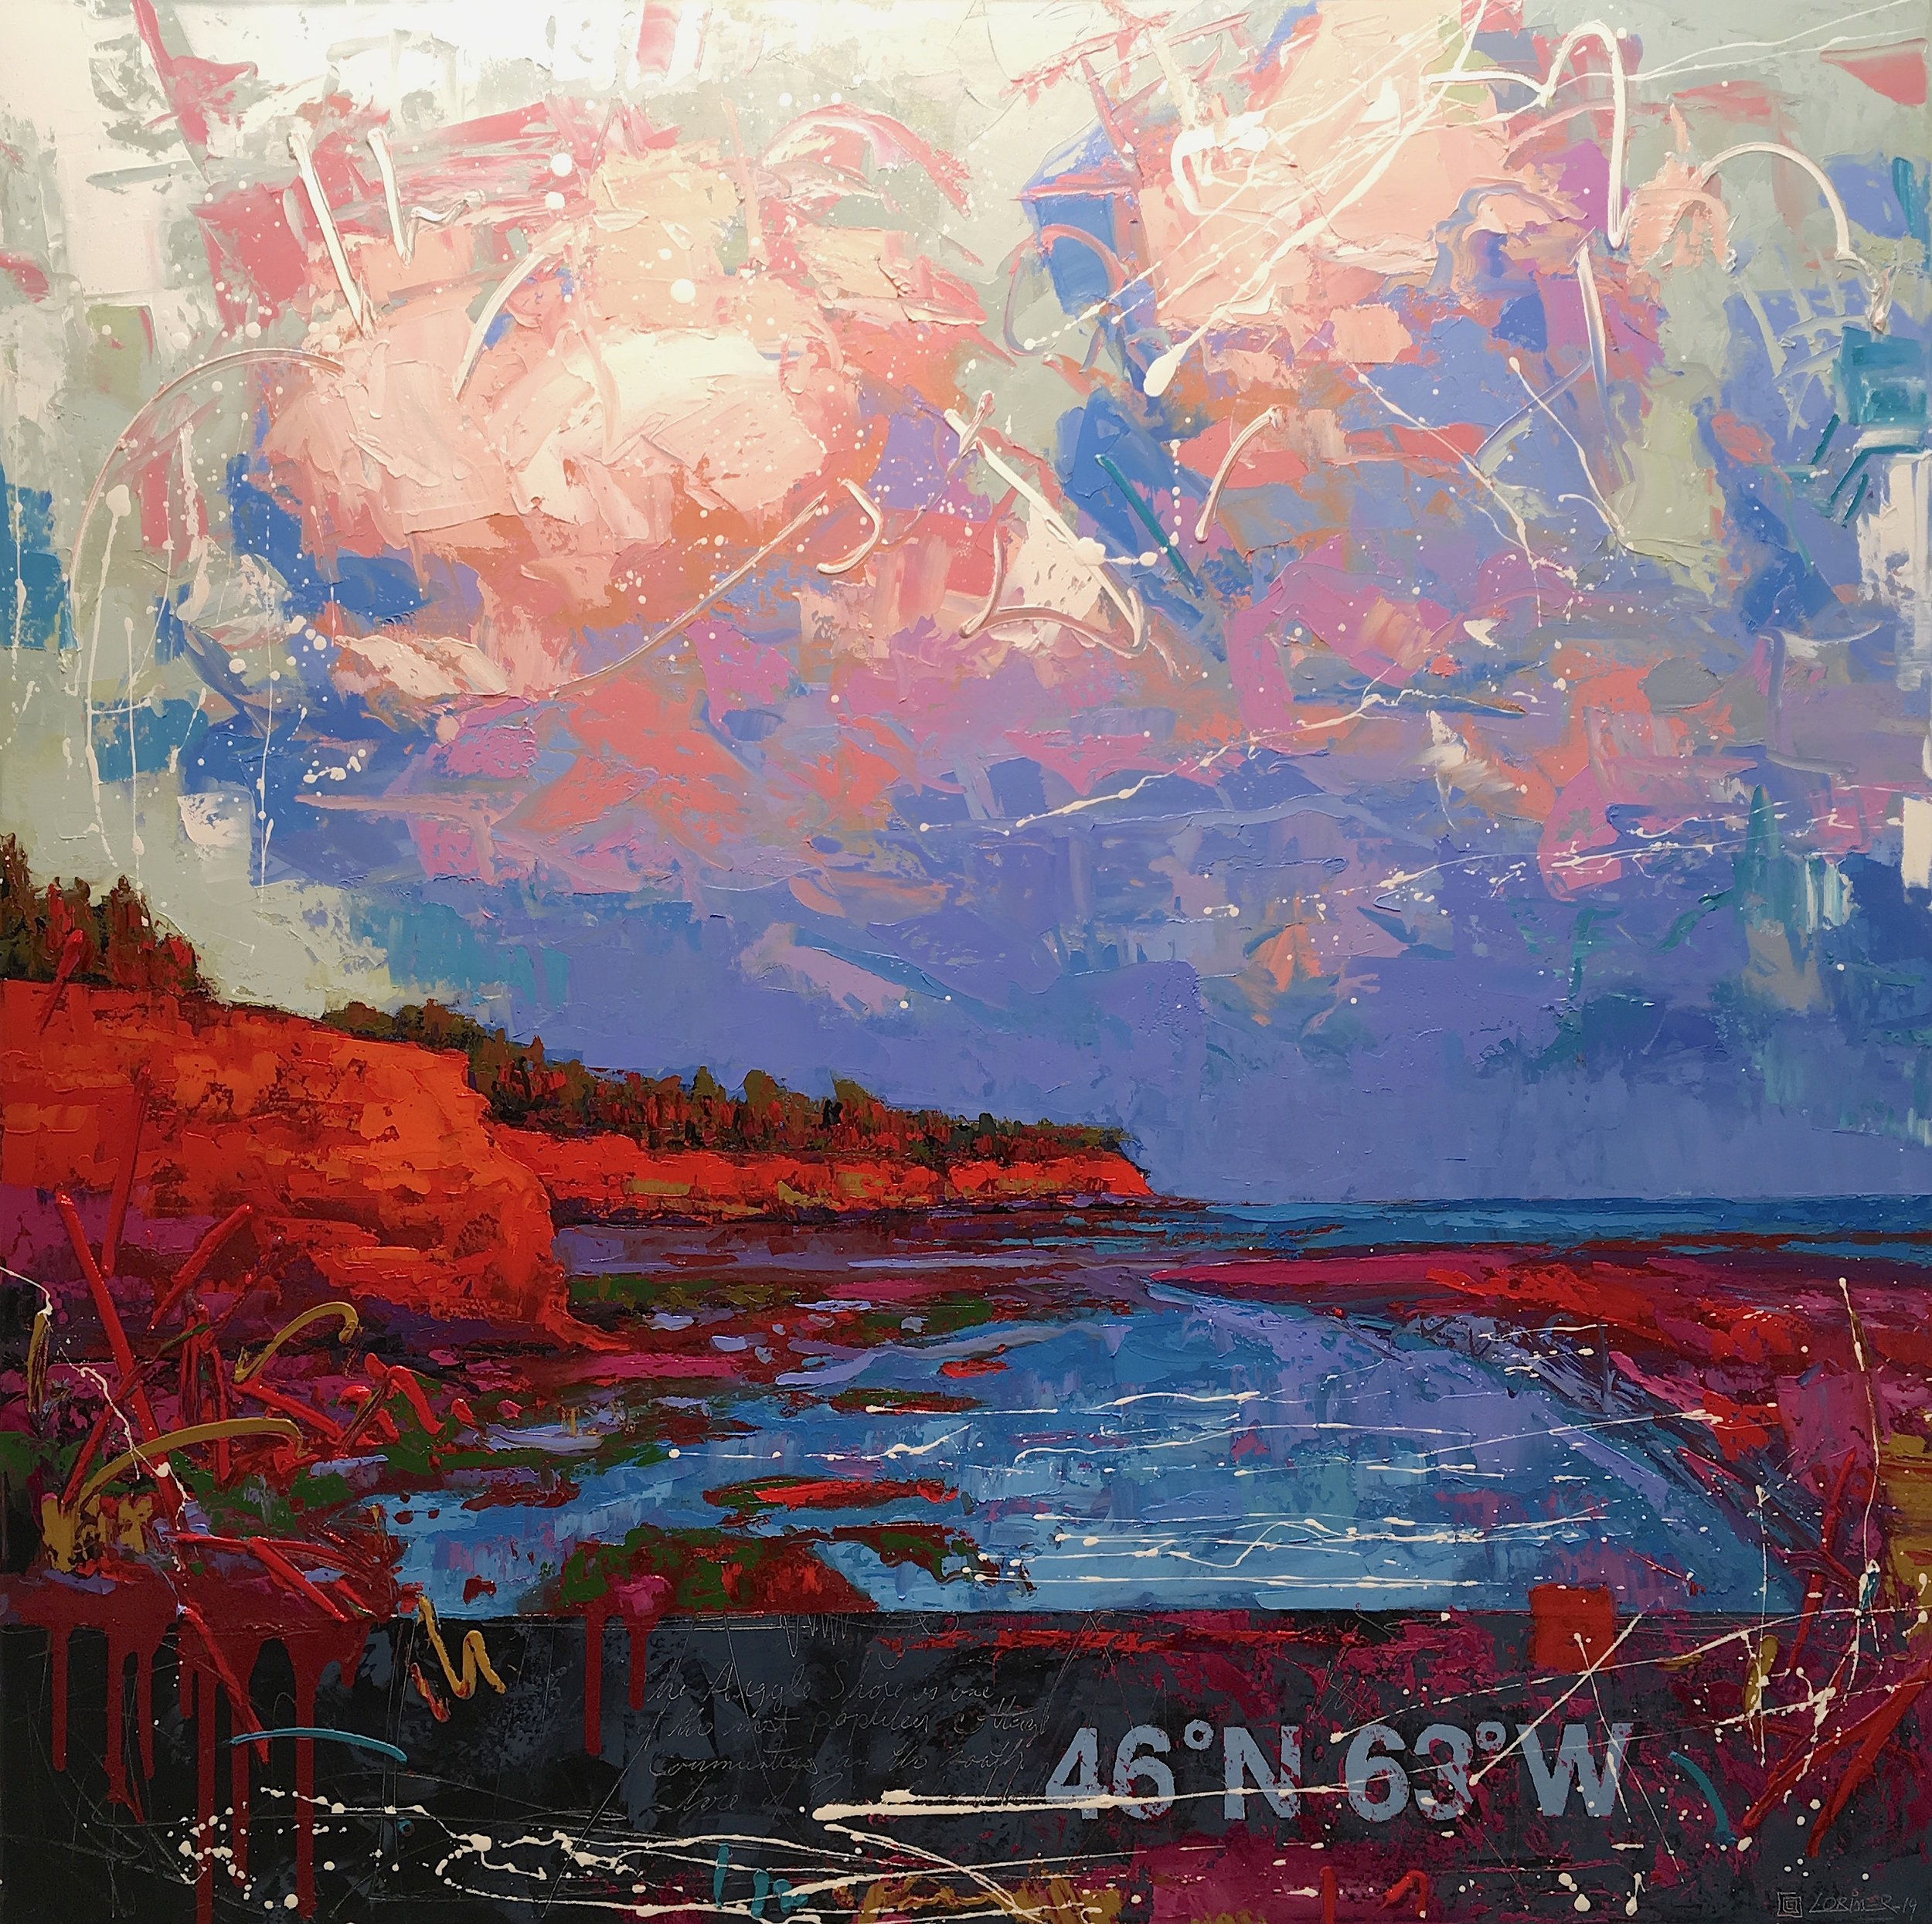 "46ºN 63ºW - Argyle Coast (40"" x 40"")"